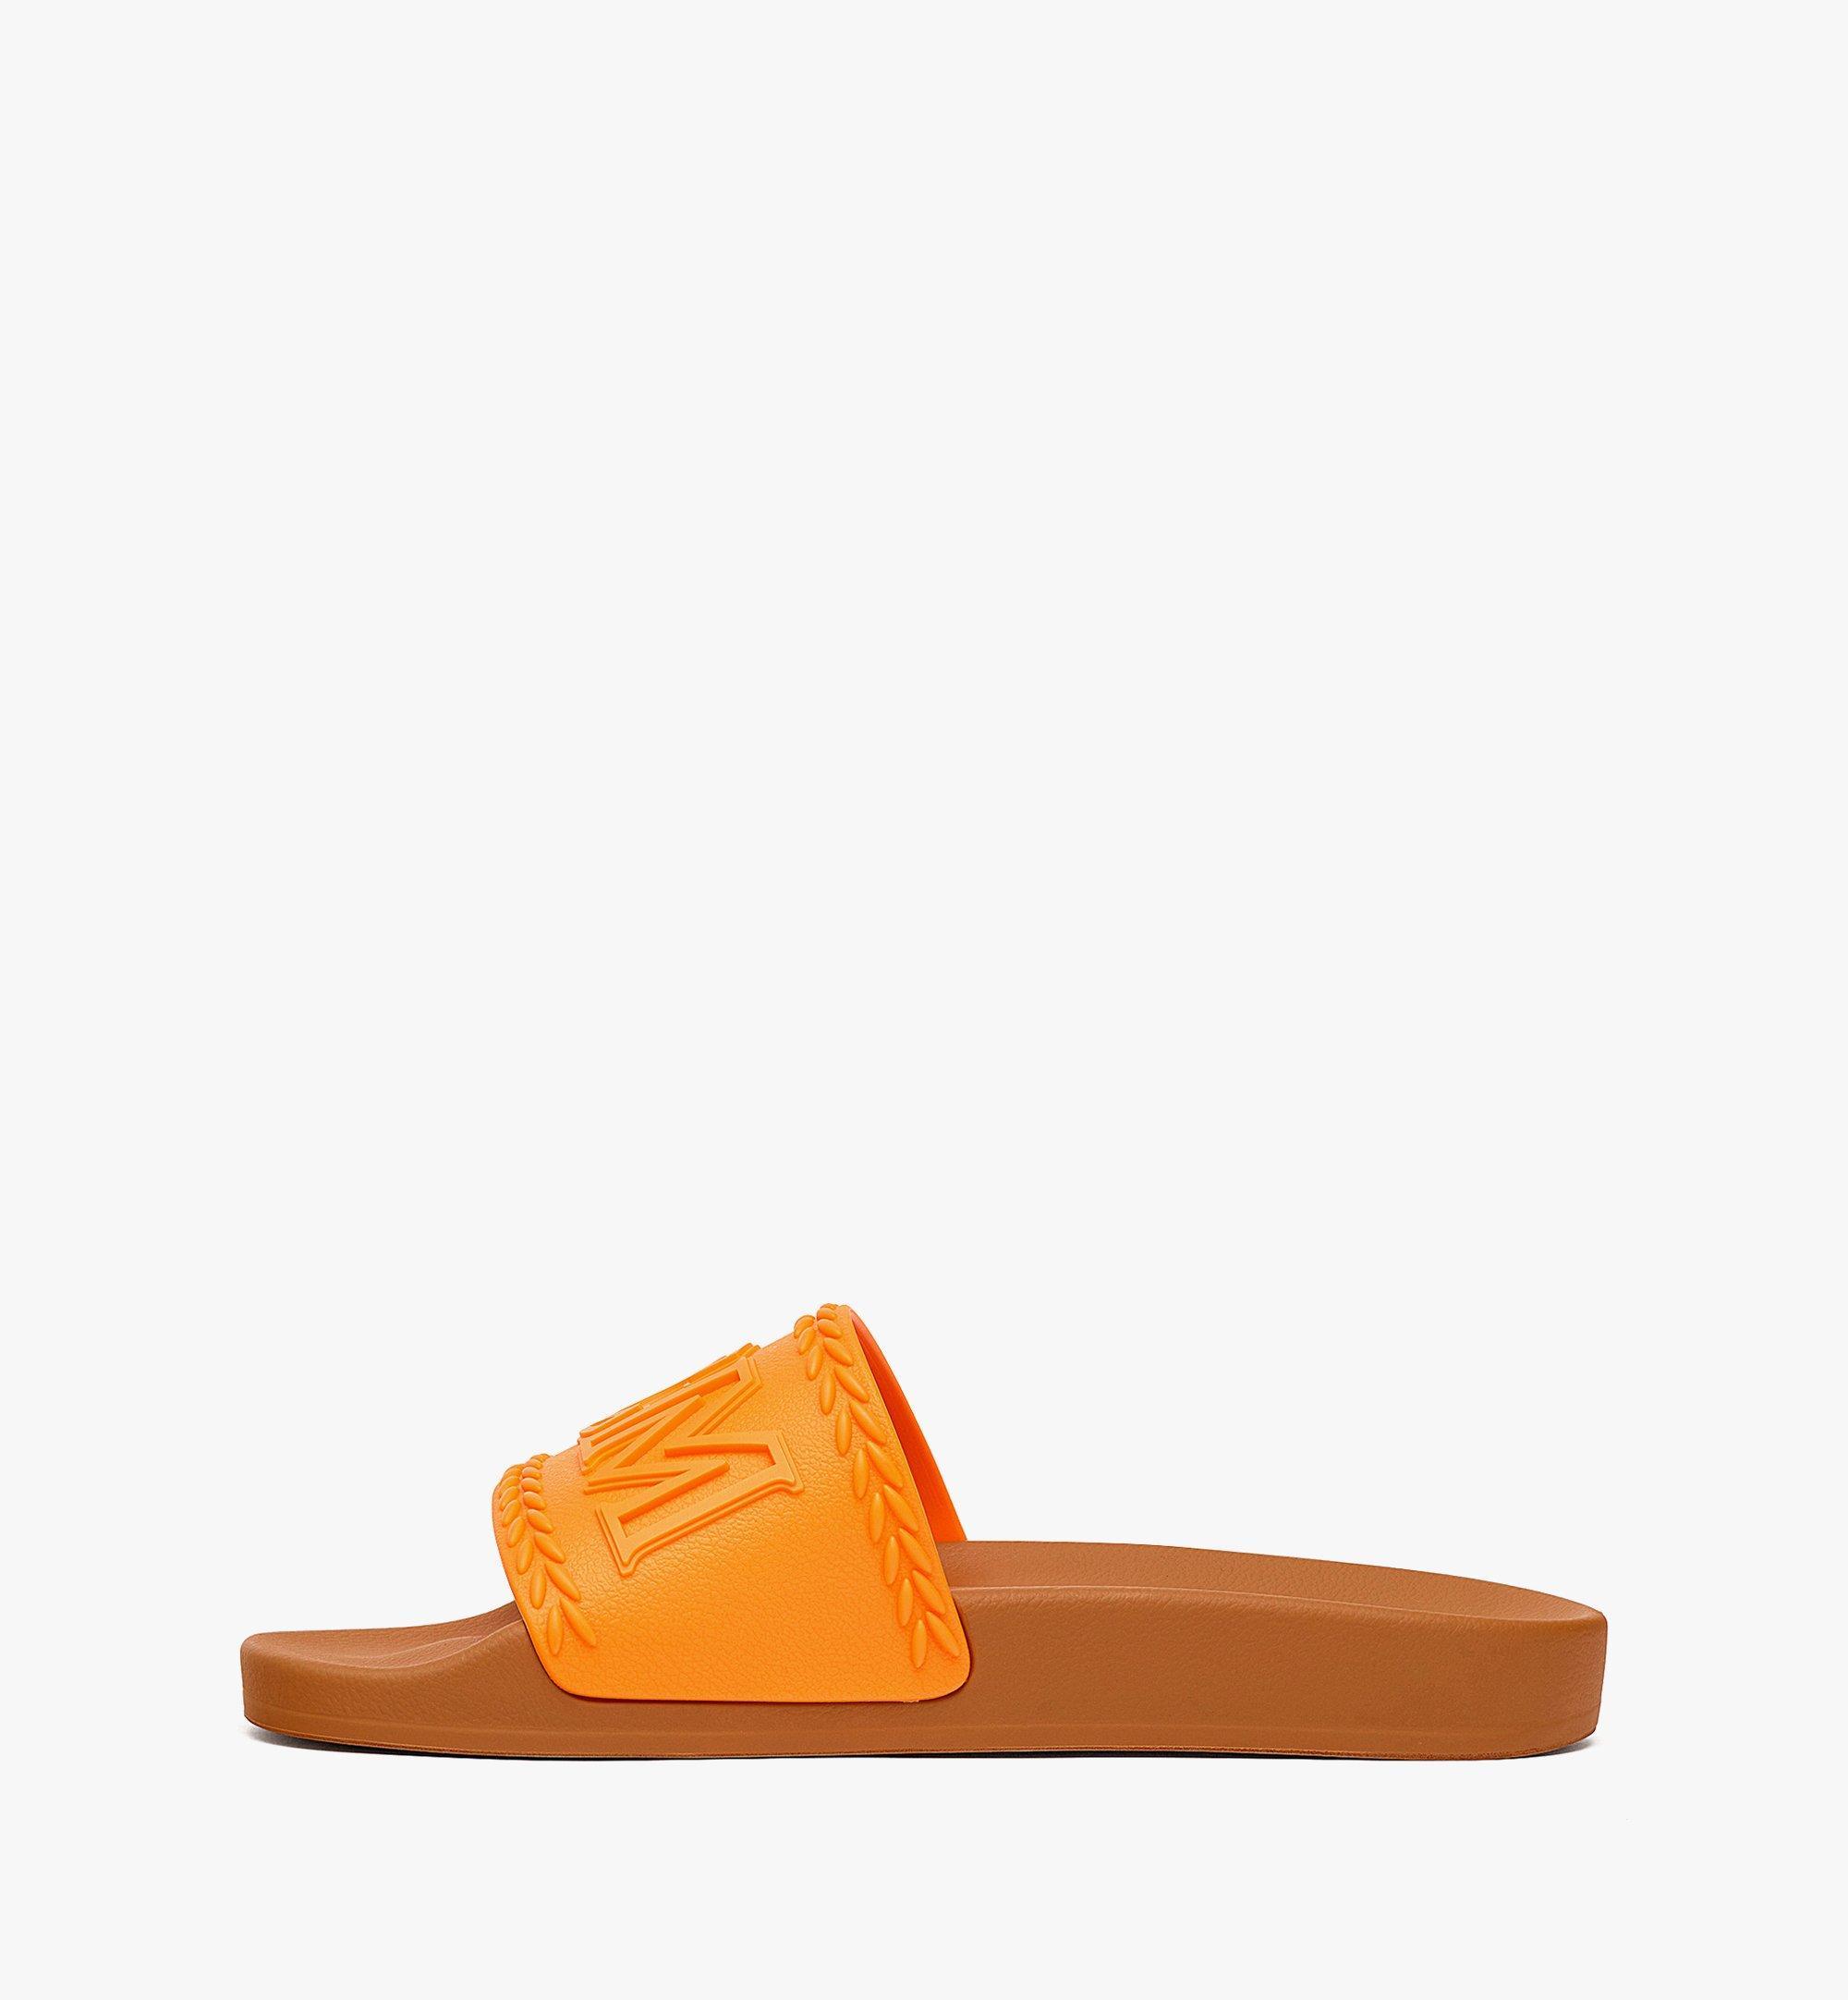 MCM 女士 Big Logo 橡膠拖鞋 Orange MESBSMM15O9036 更多視圖 1